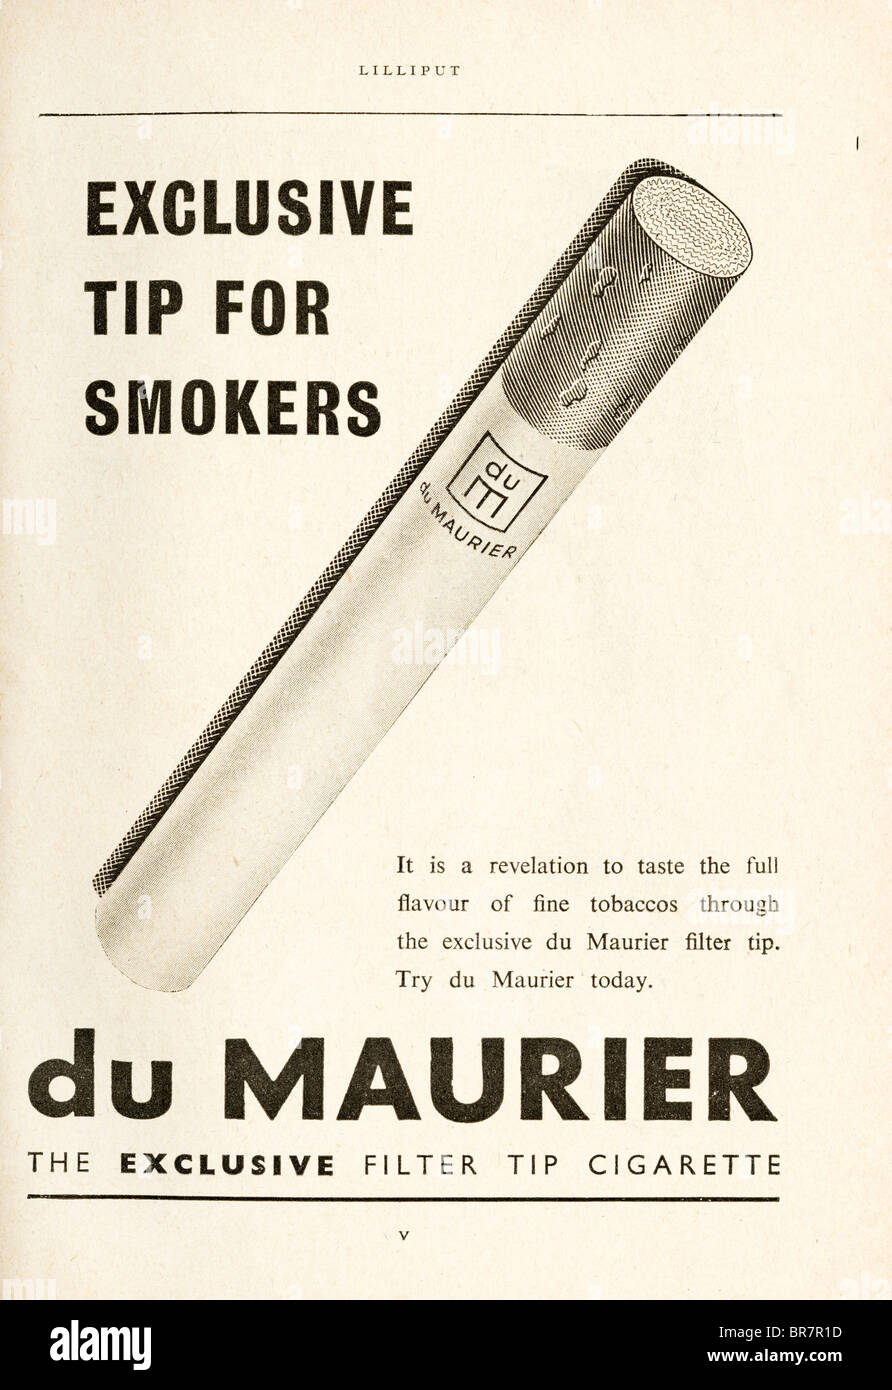 Black and white advert for du Maurier filter tip cigarette inside Lilliput magazine dated November 1947 - Stock Image